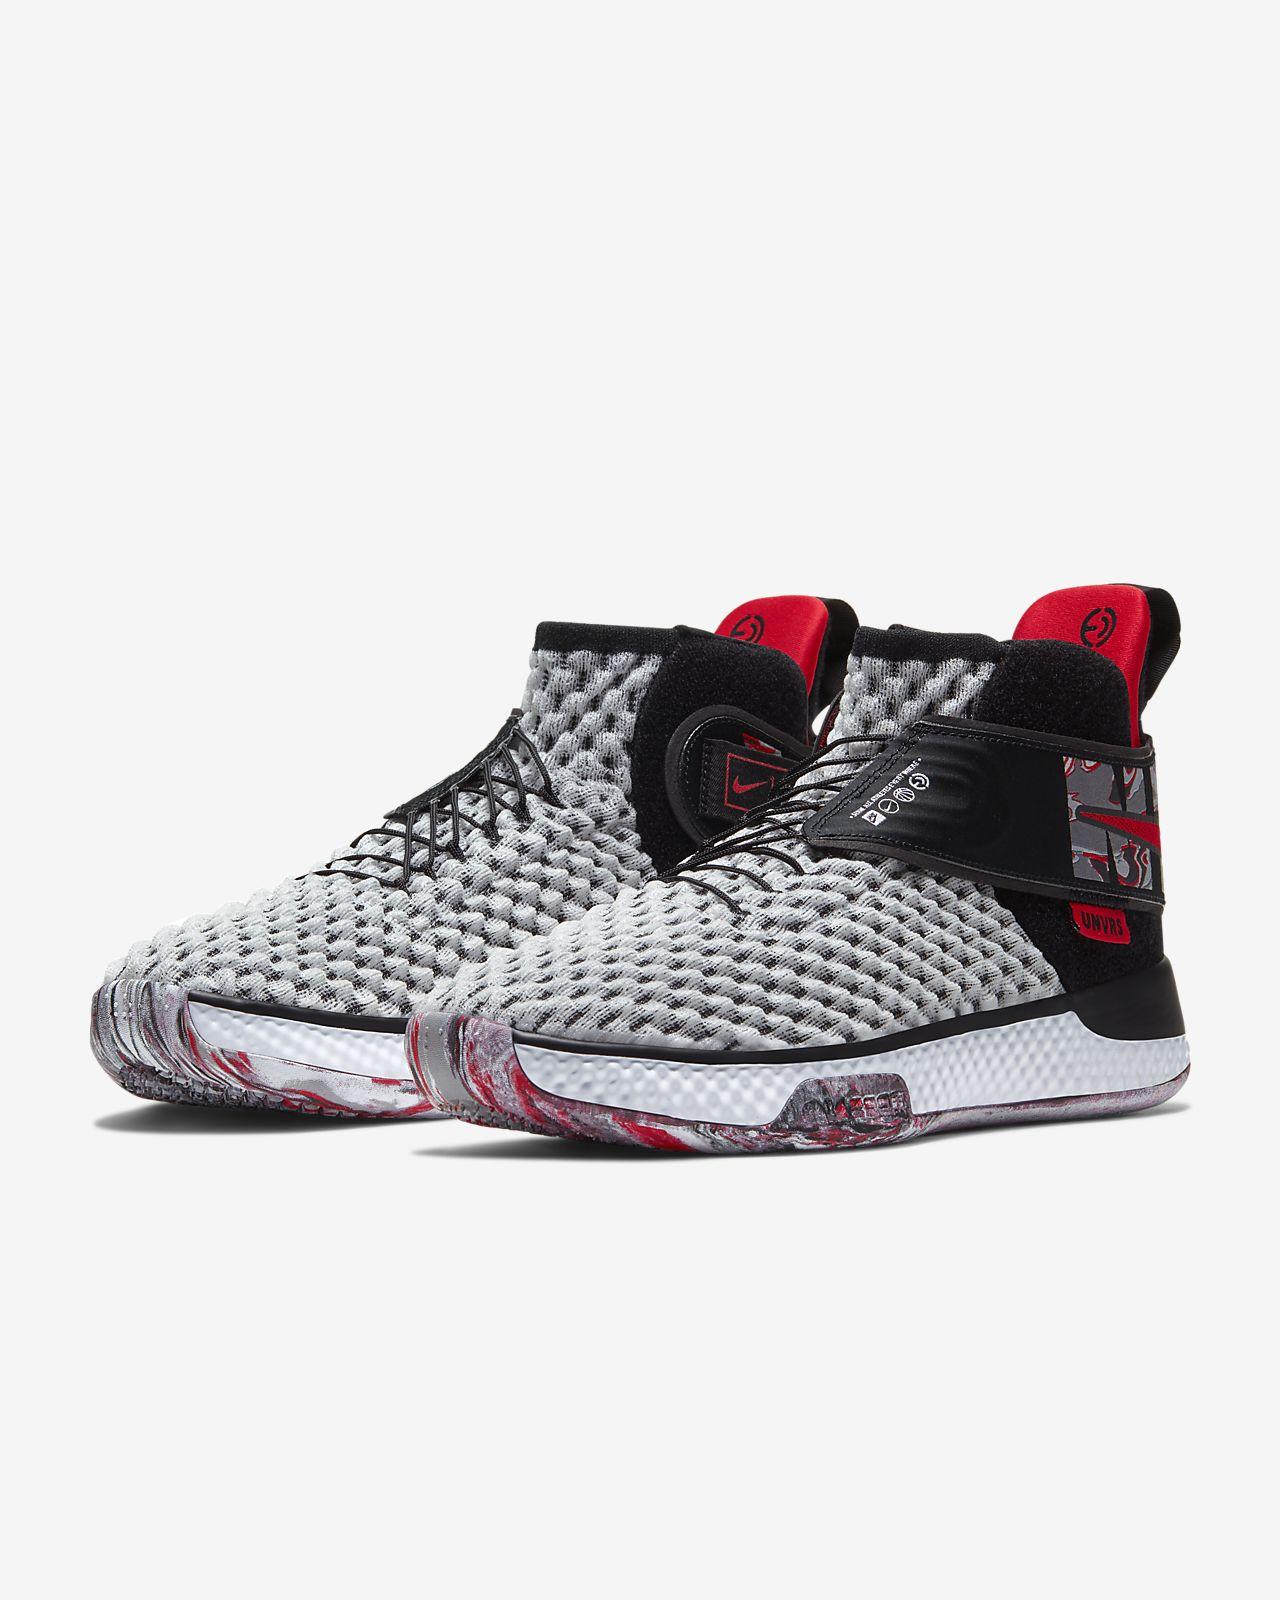 Air FlyEase Nike Zoom UNVRS Basketballschuh 0PnwOk8X